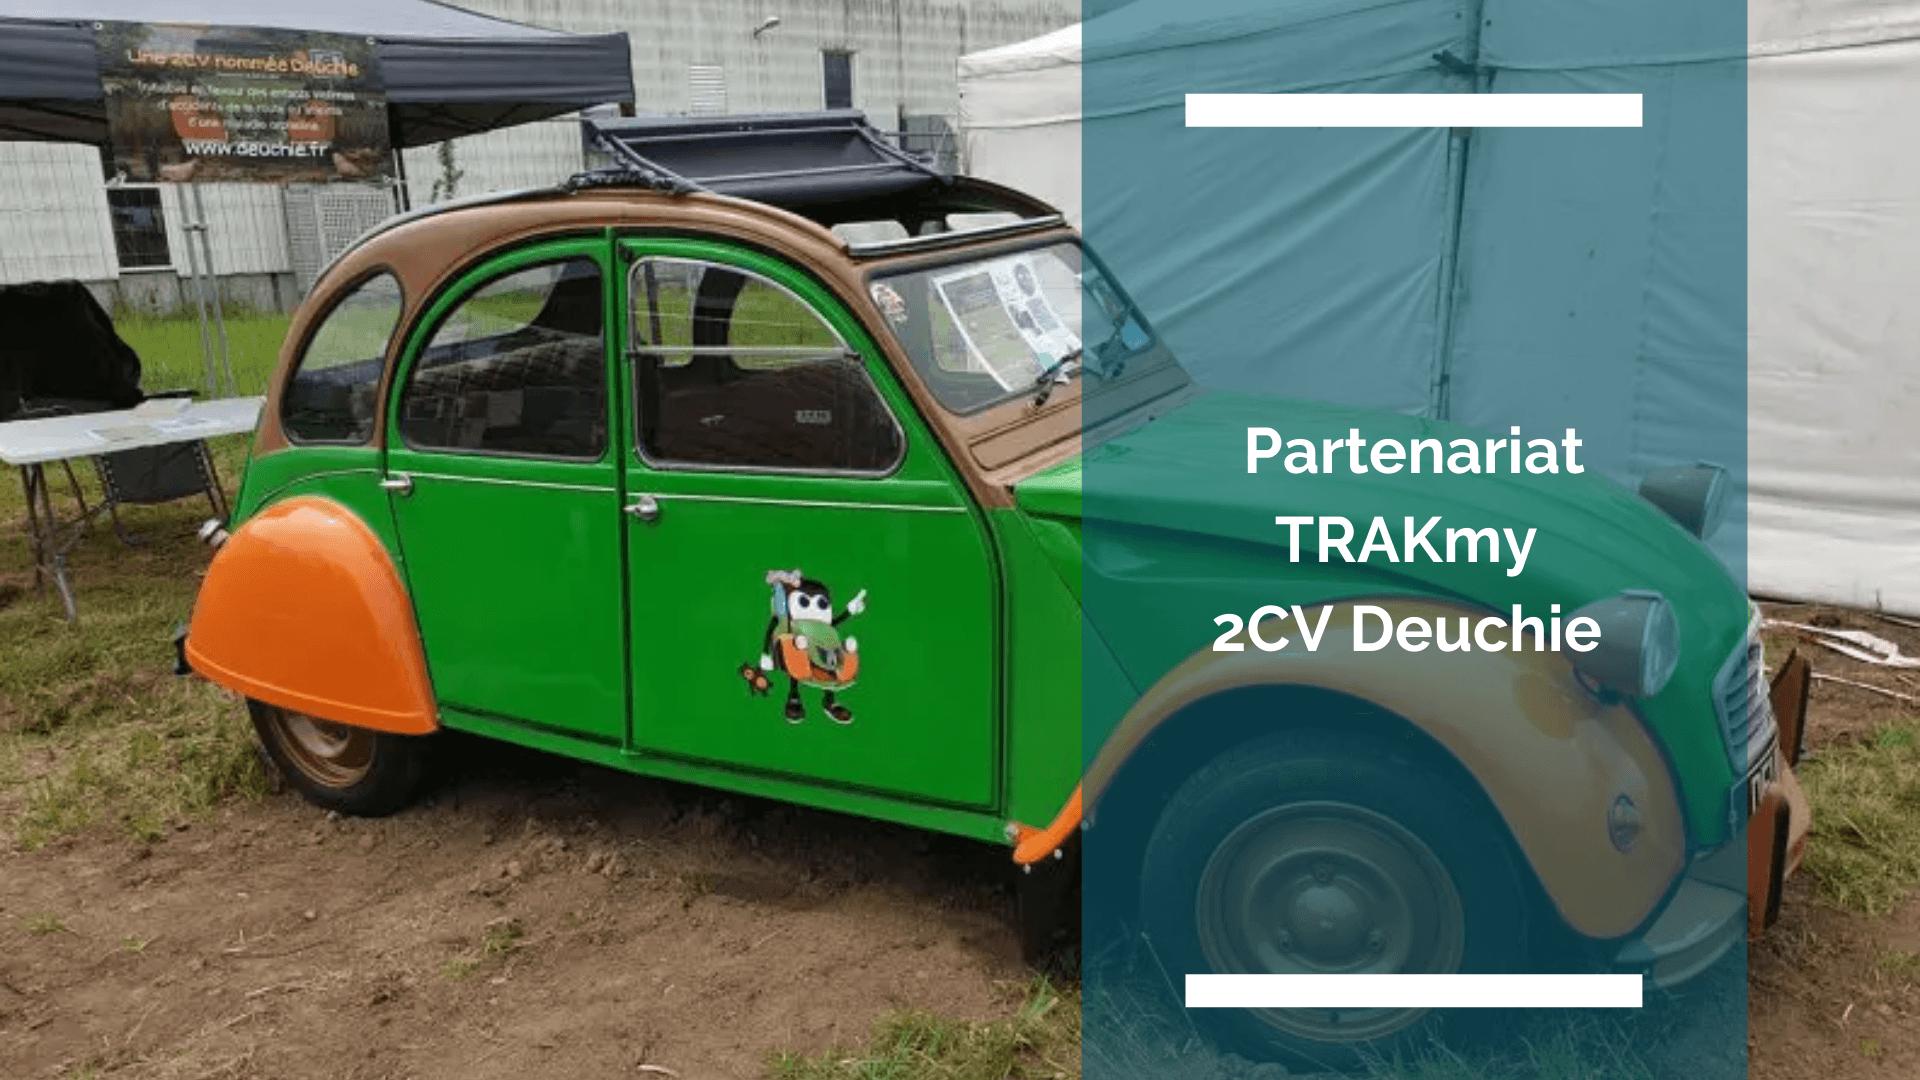 Visuel de l'article : partenariat TRAKmy 2cv Deuchie